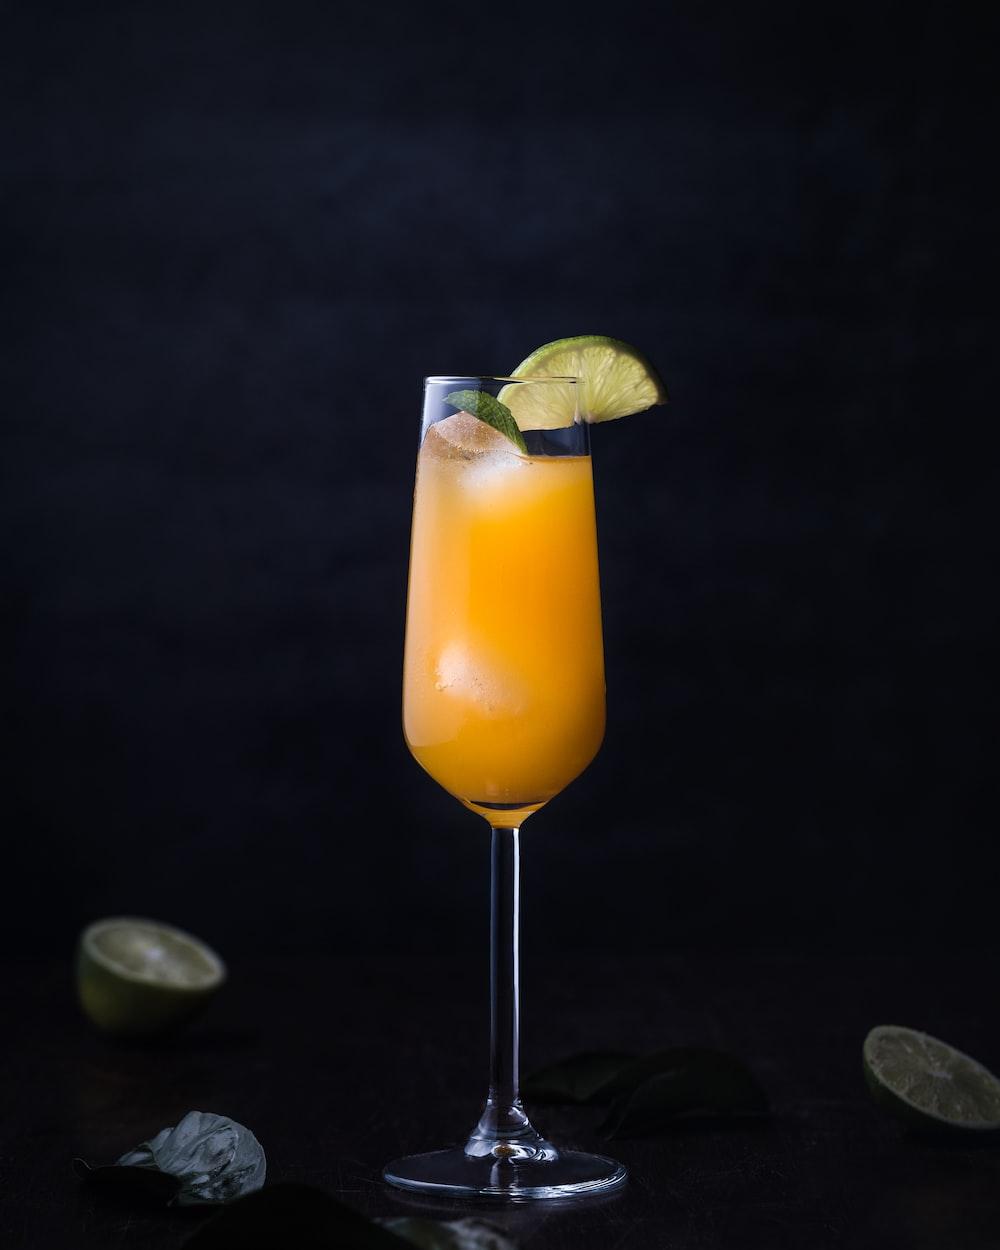 orange juice on clear glass